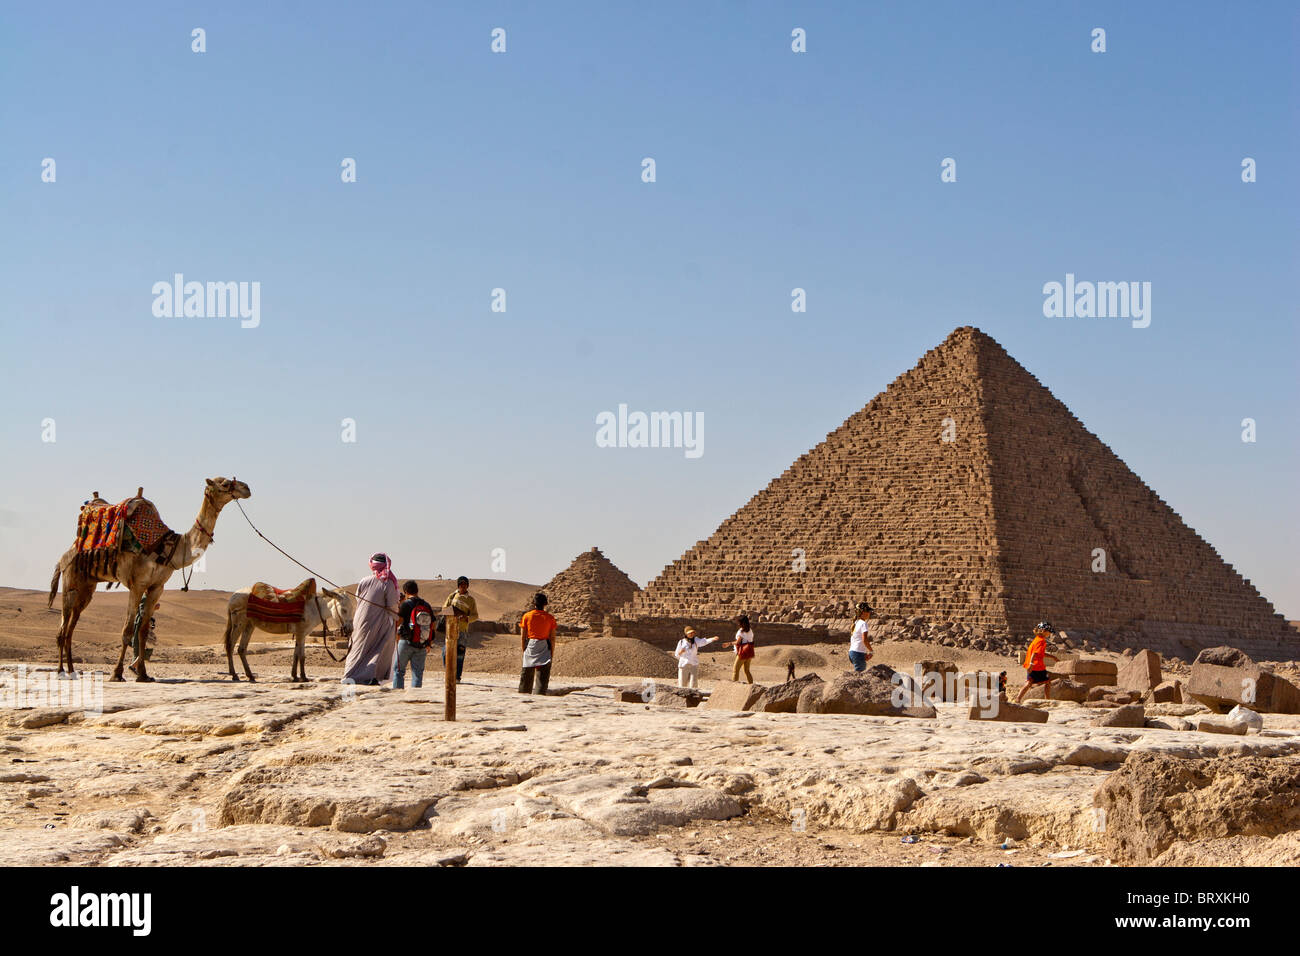 The Pyramid of Menkaure at Giza, Egypt. - Stock Image